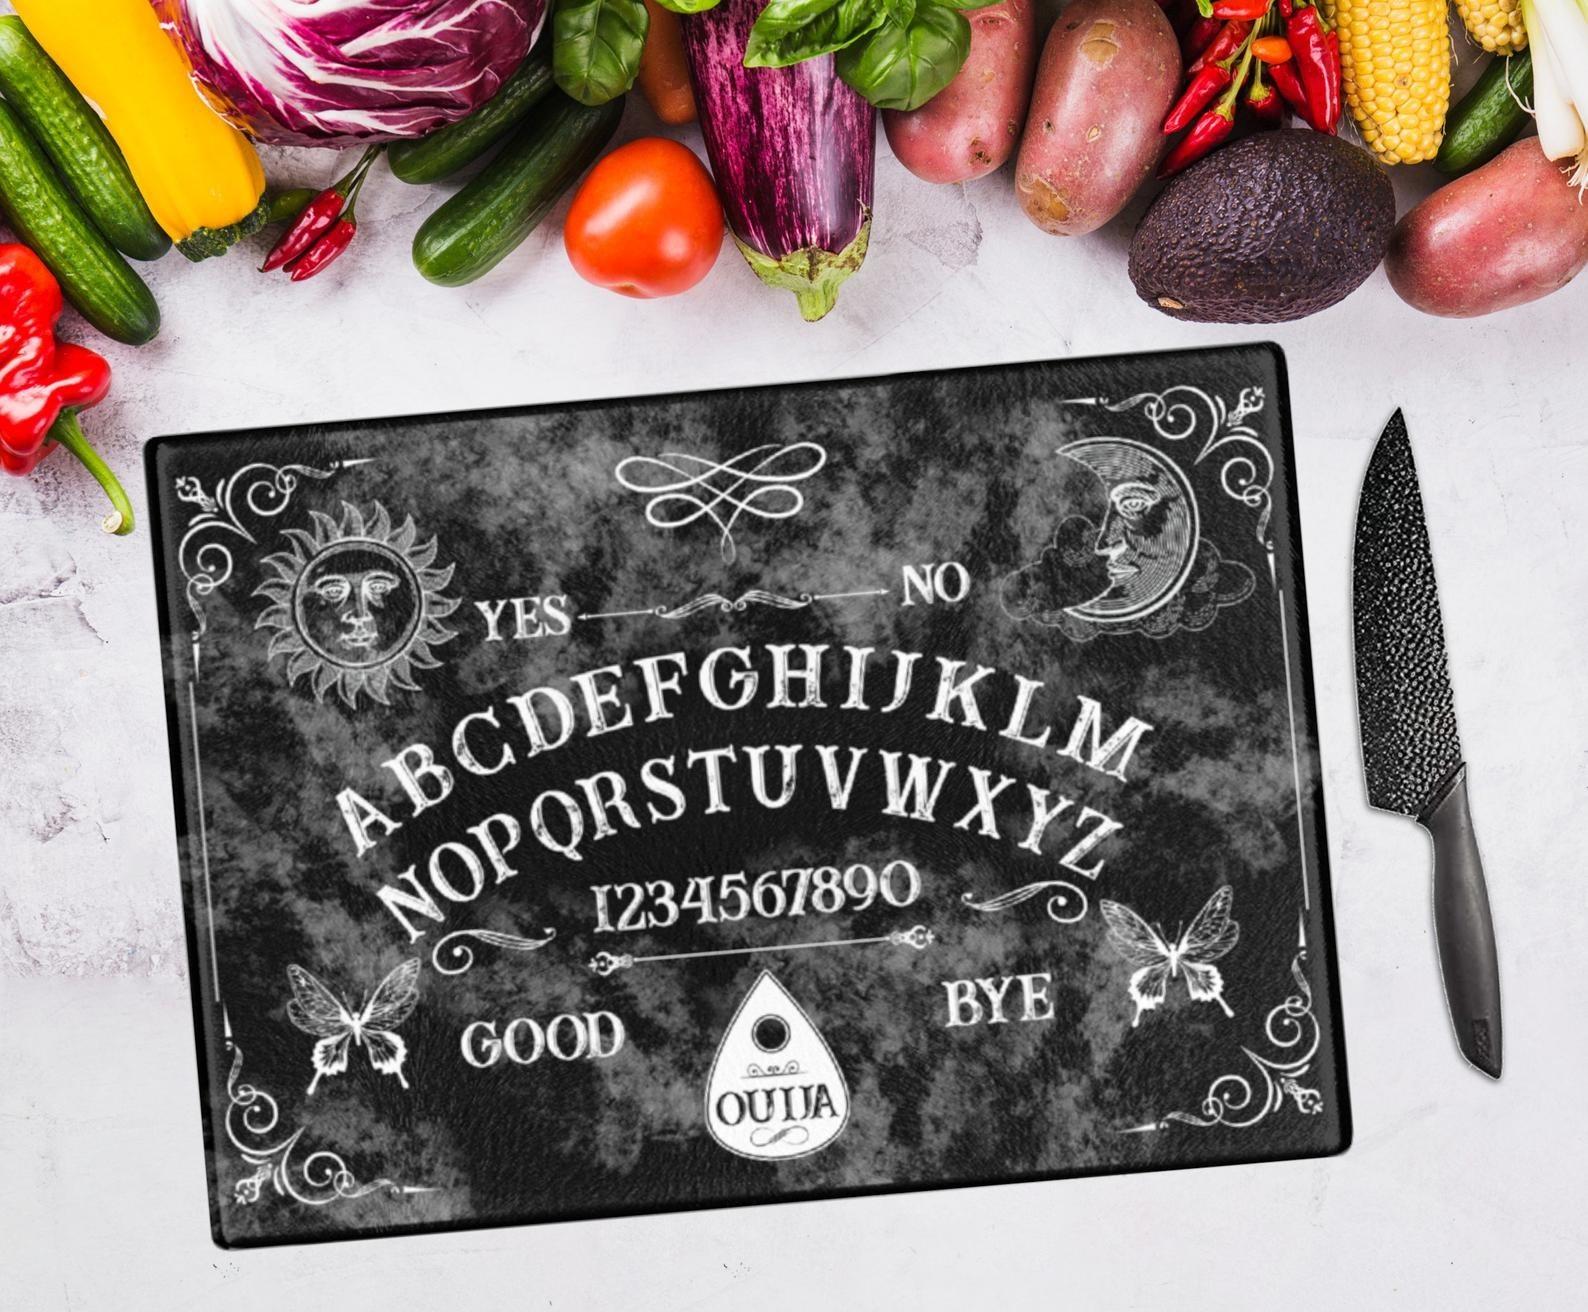 the black cutting board that looks like a ouija board